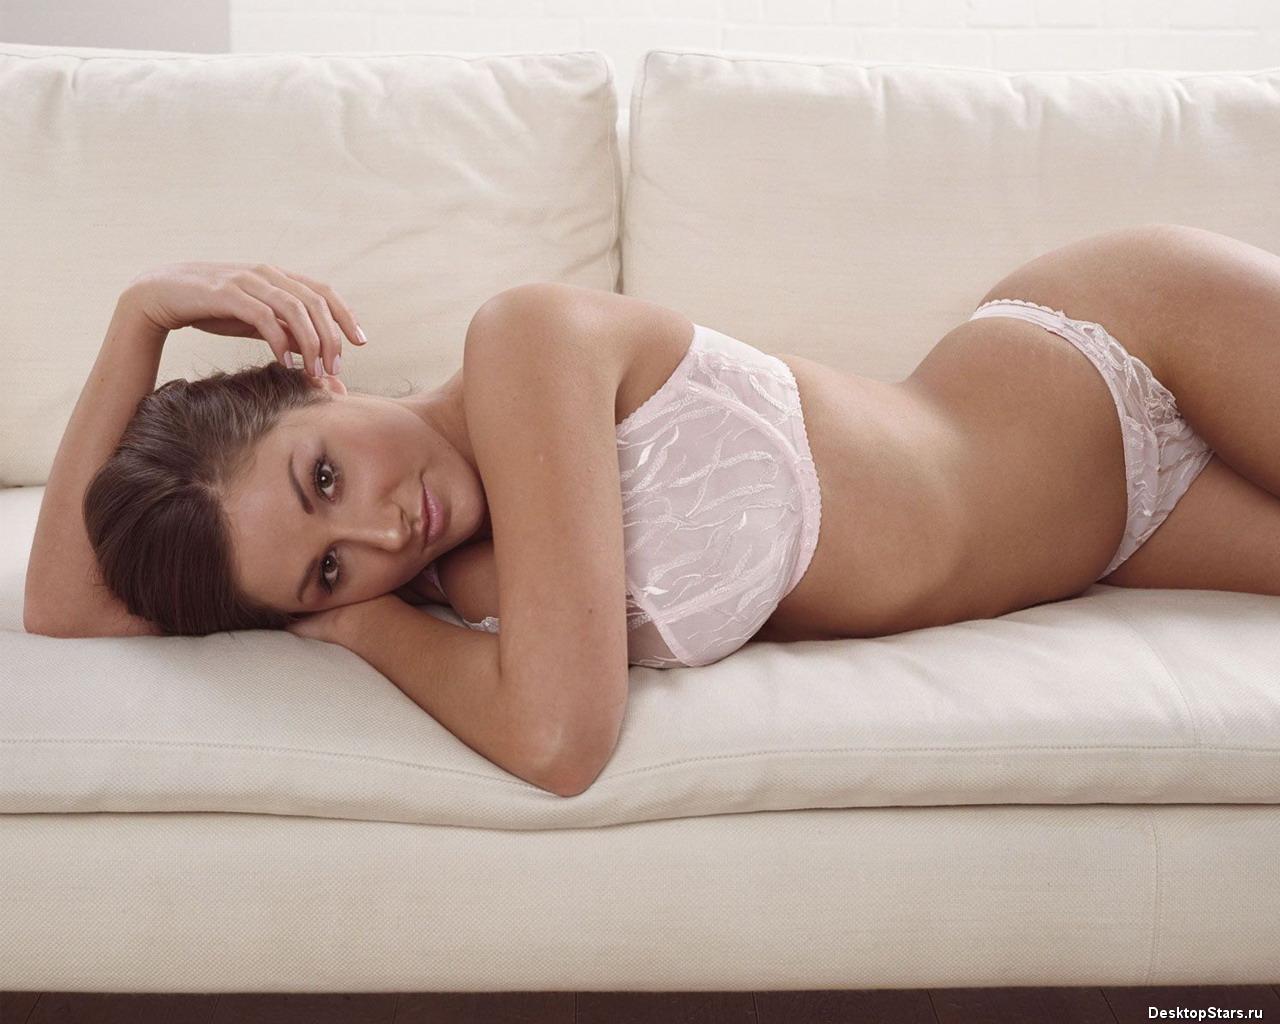 Lucy Pinder 1280x1024 big boobs string bikini free wallpaper